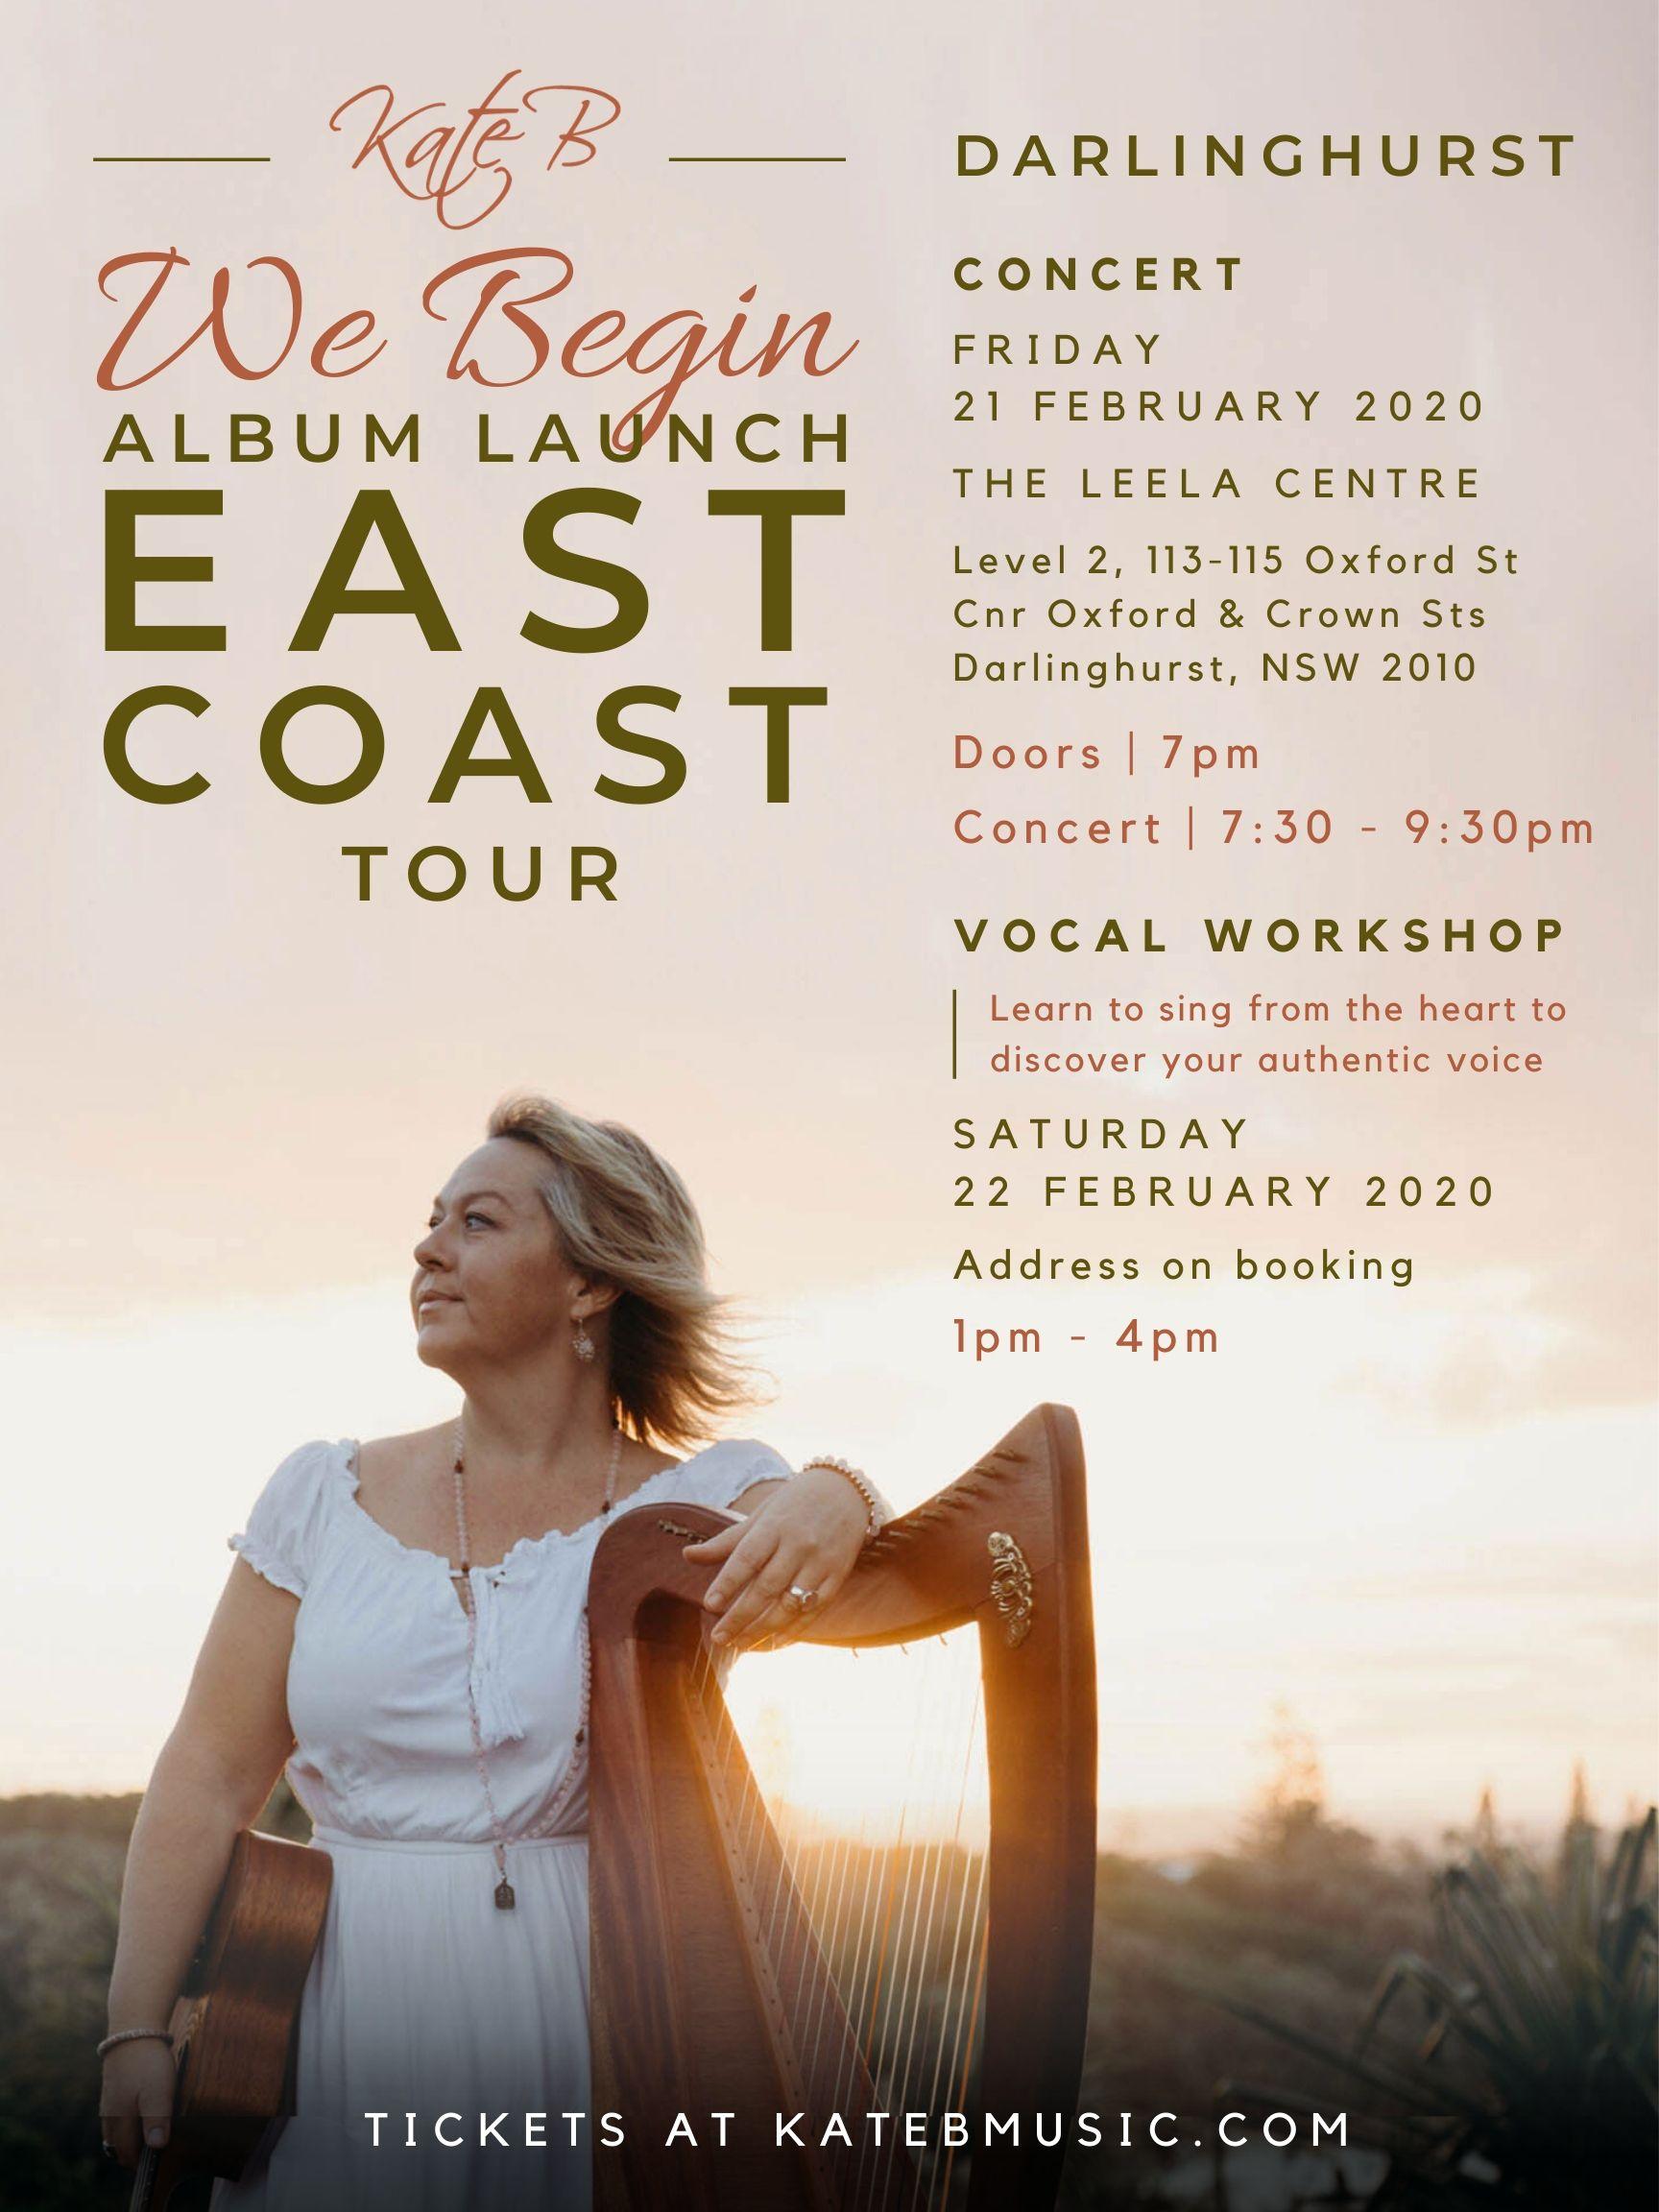 East Coast Tour - Darlinghurst